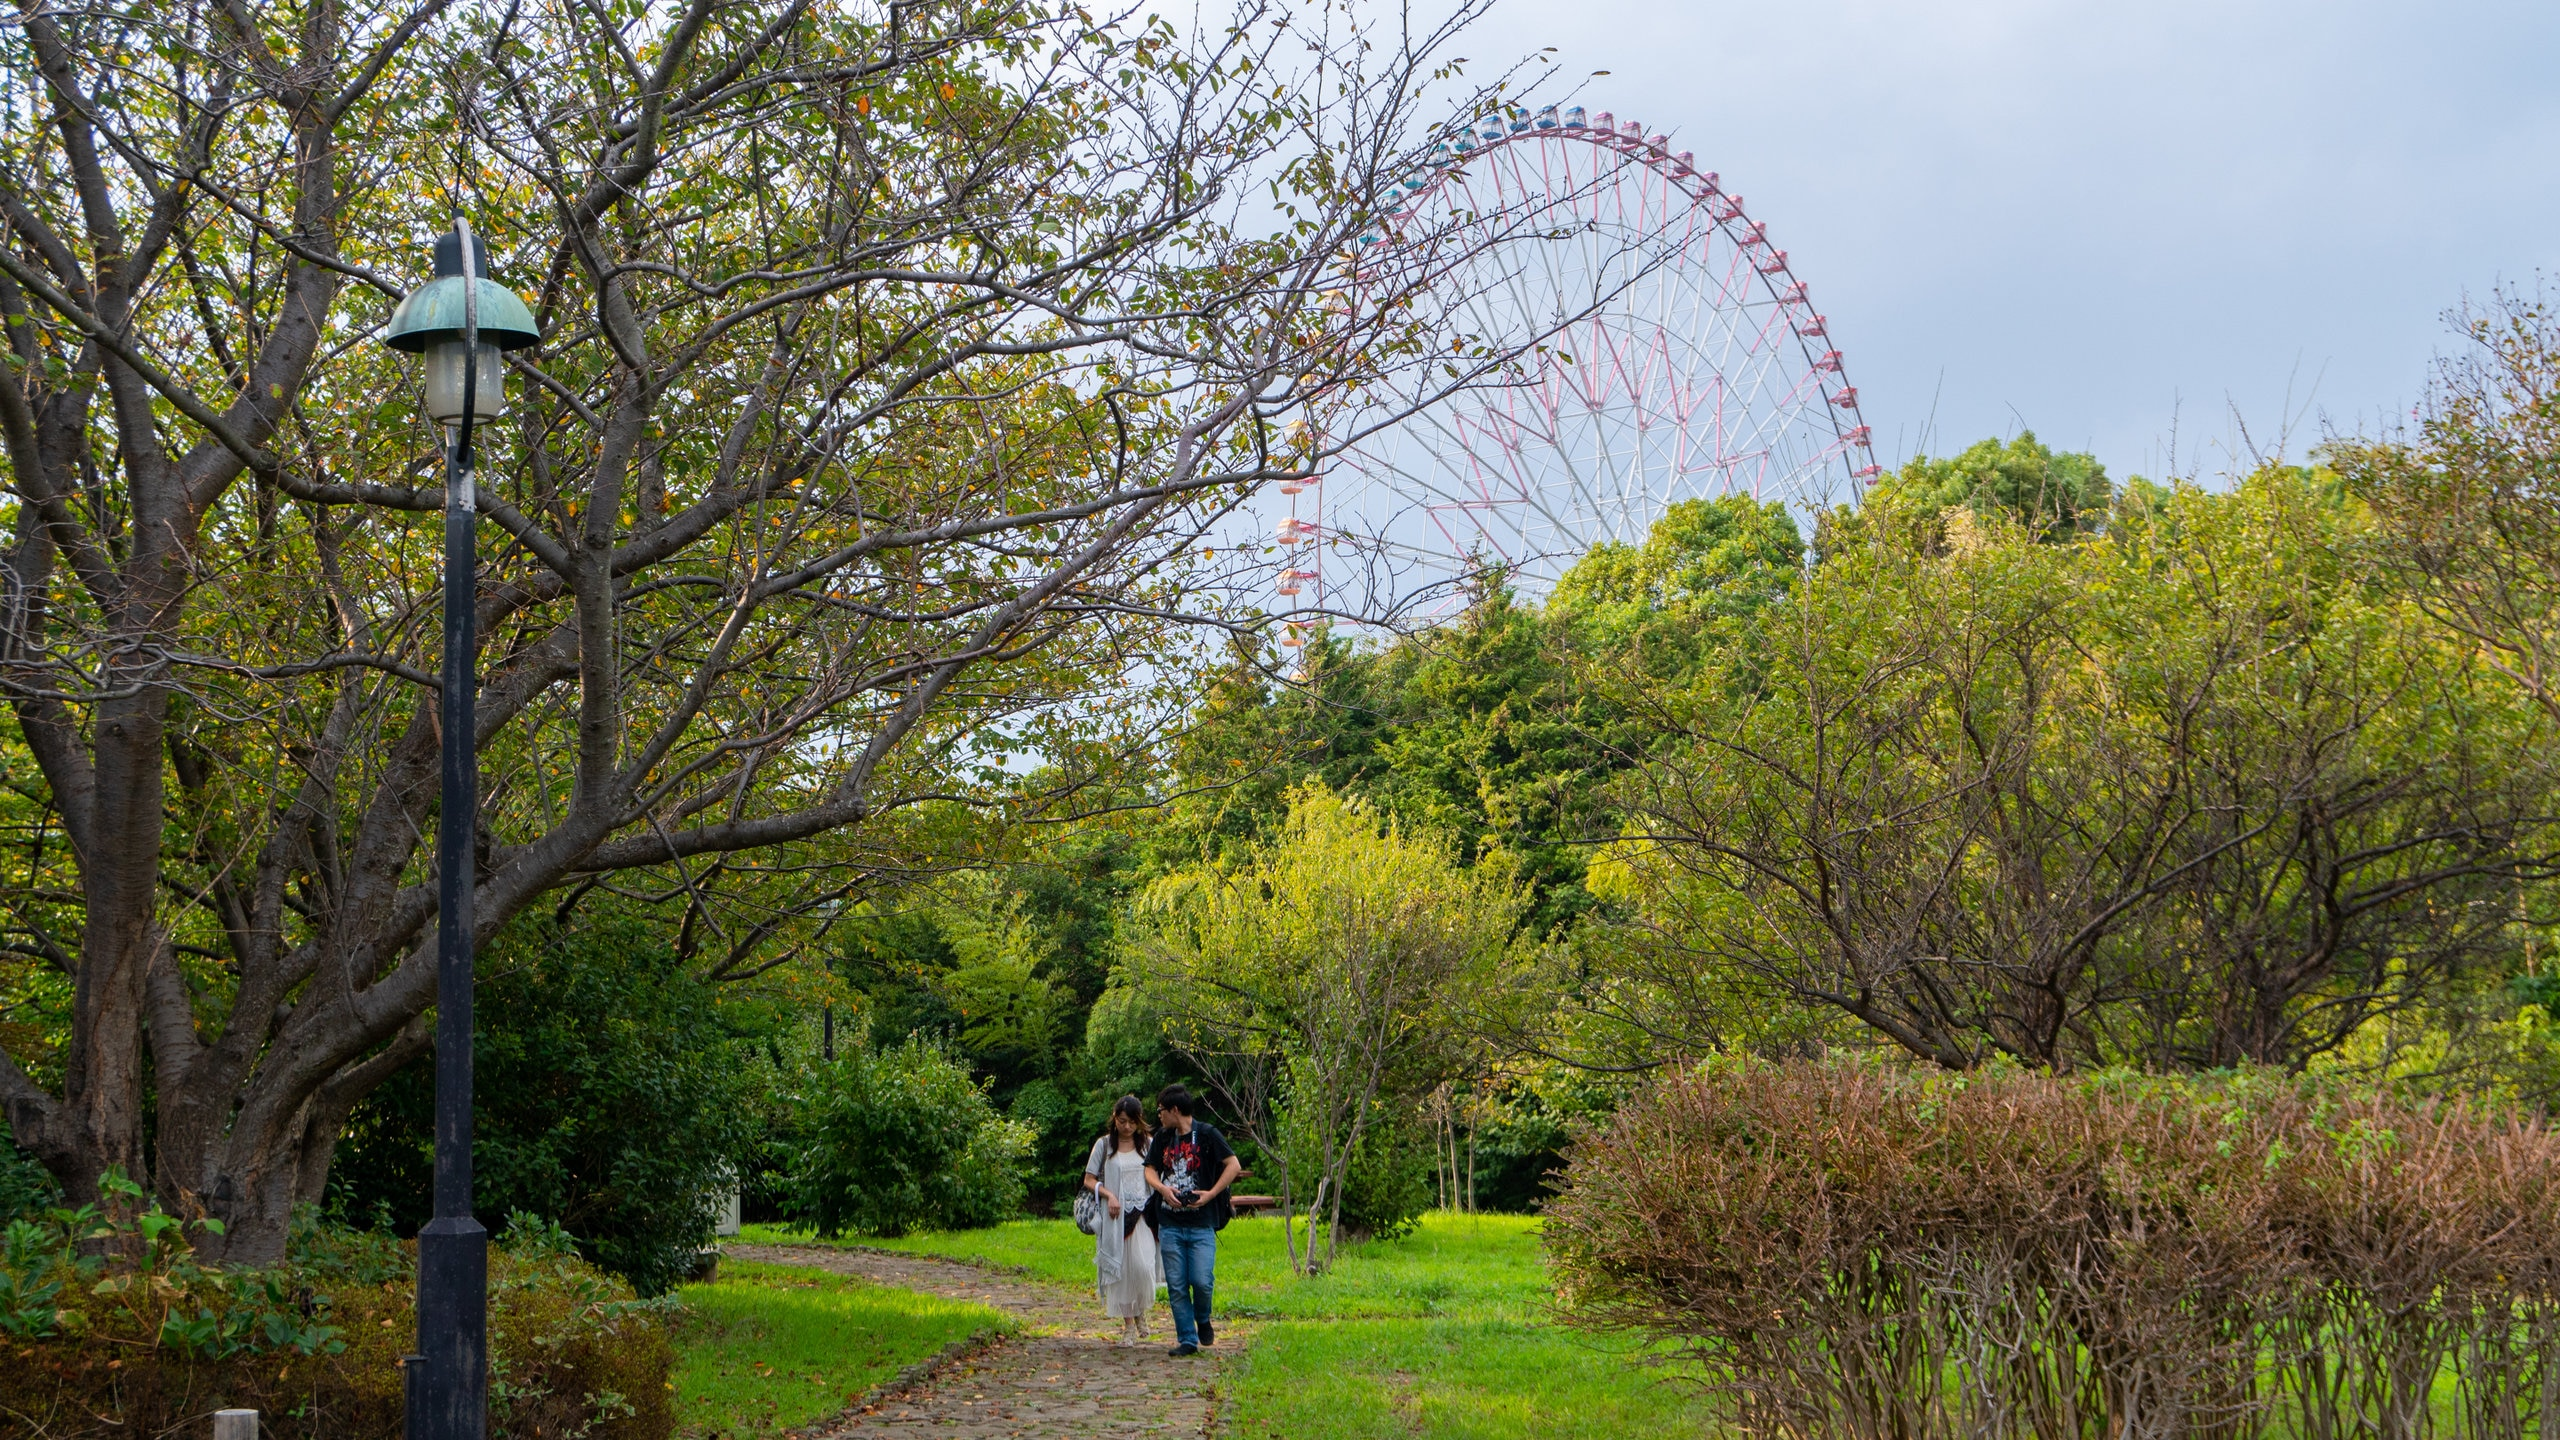 Kasairinkai Park